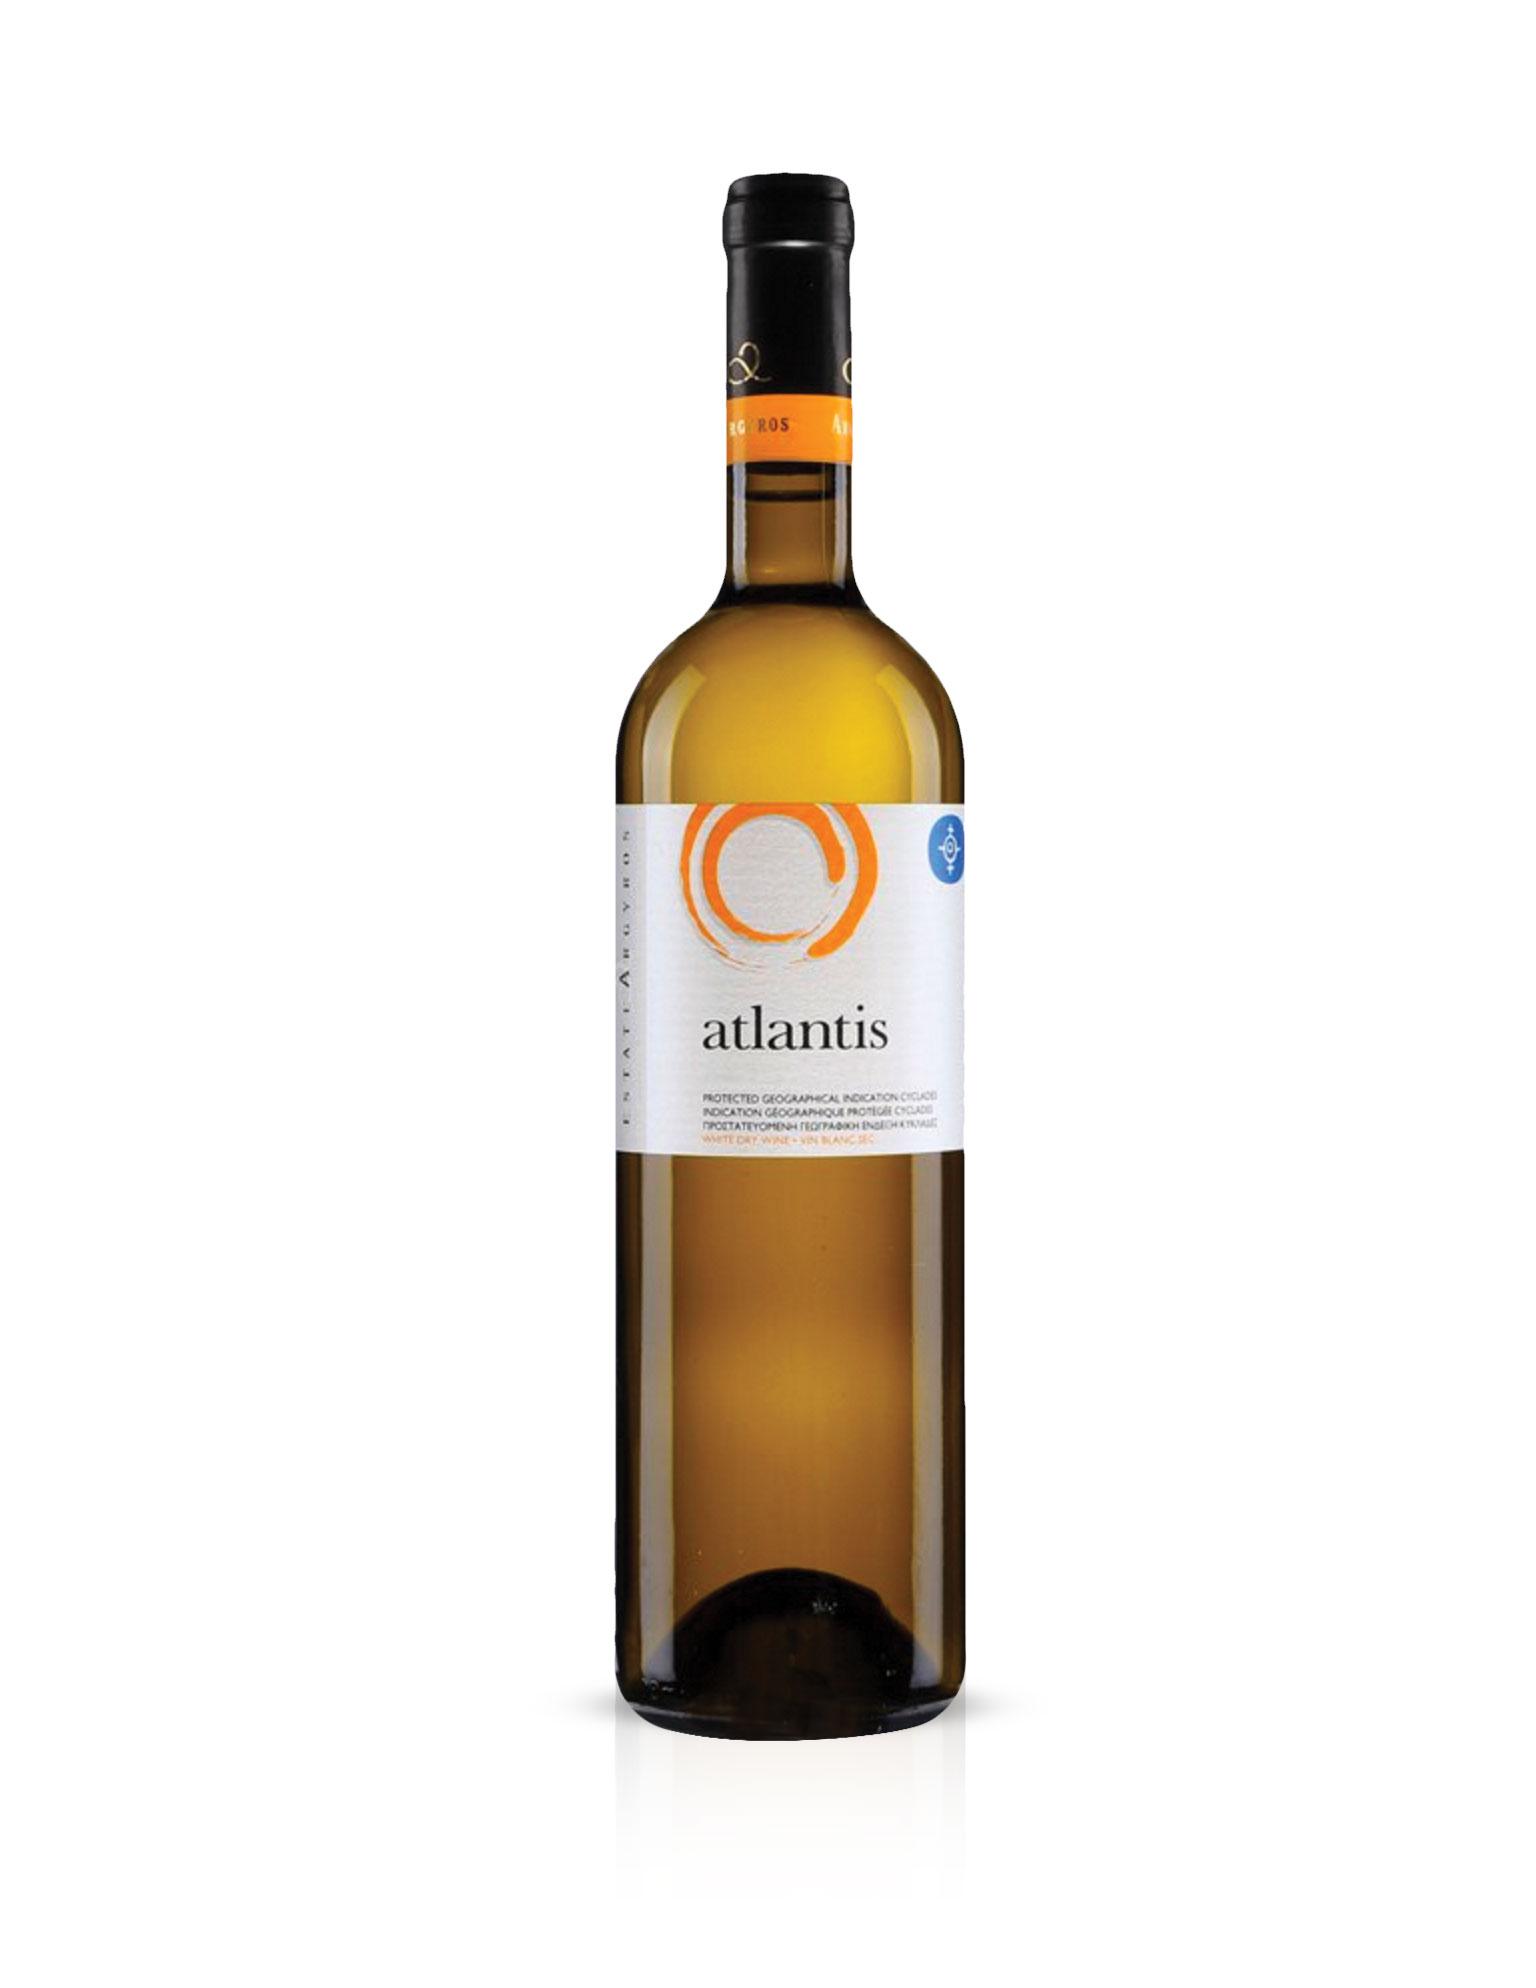 Agyros Atlantis 2016